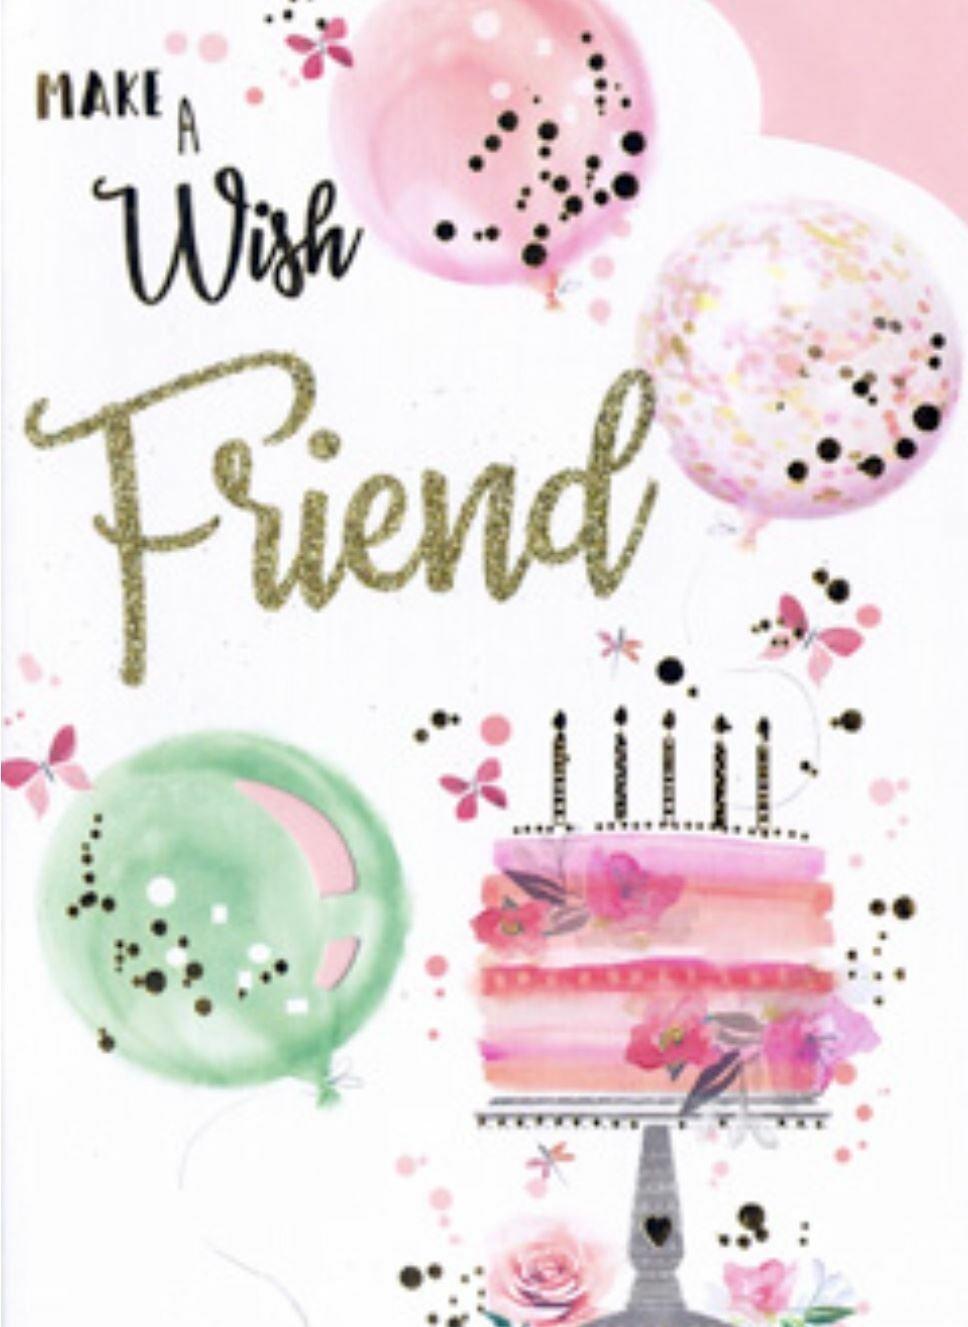 Open Female Friend Birthday Card Happy Birthday By Love Wishes Free P P Ebay